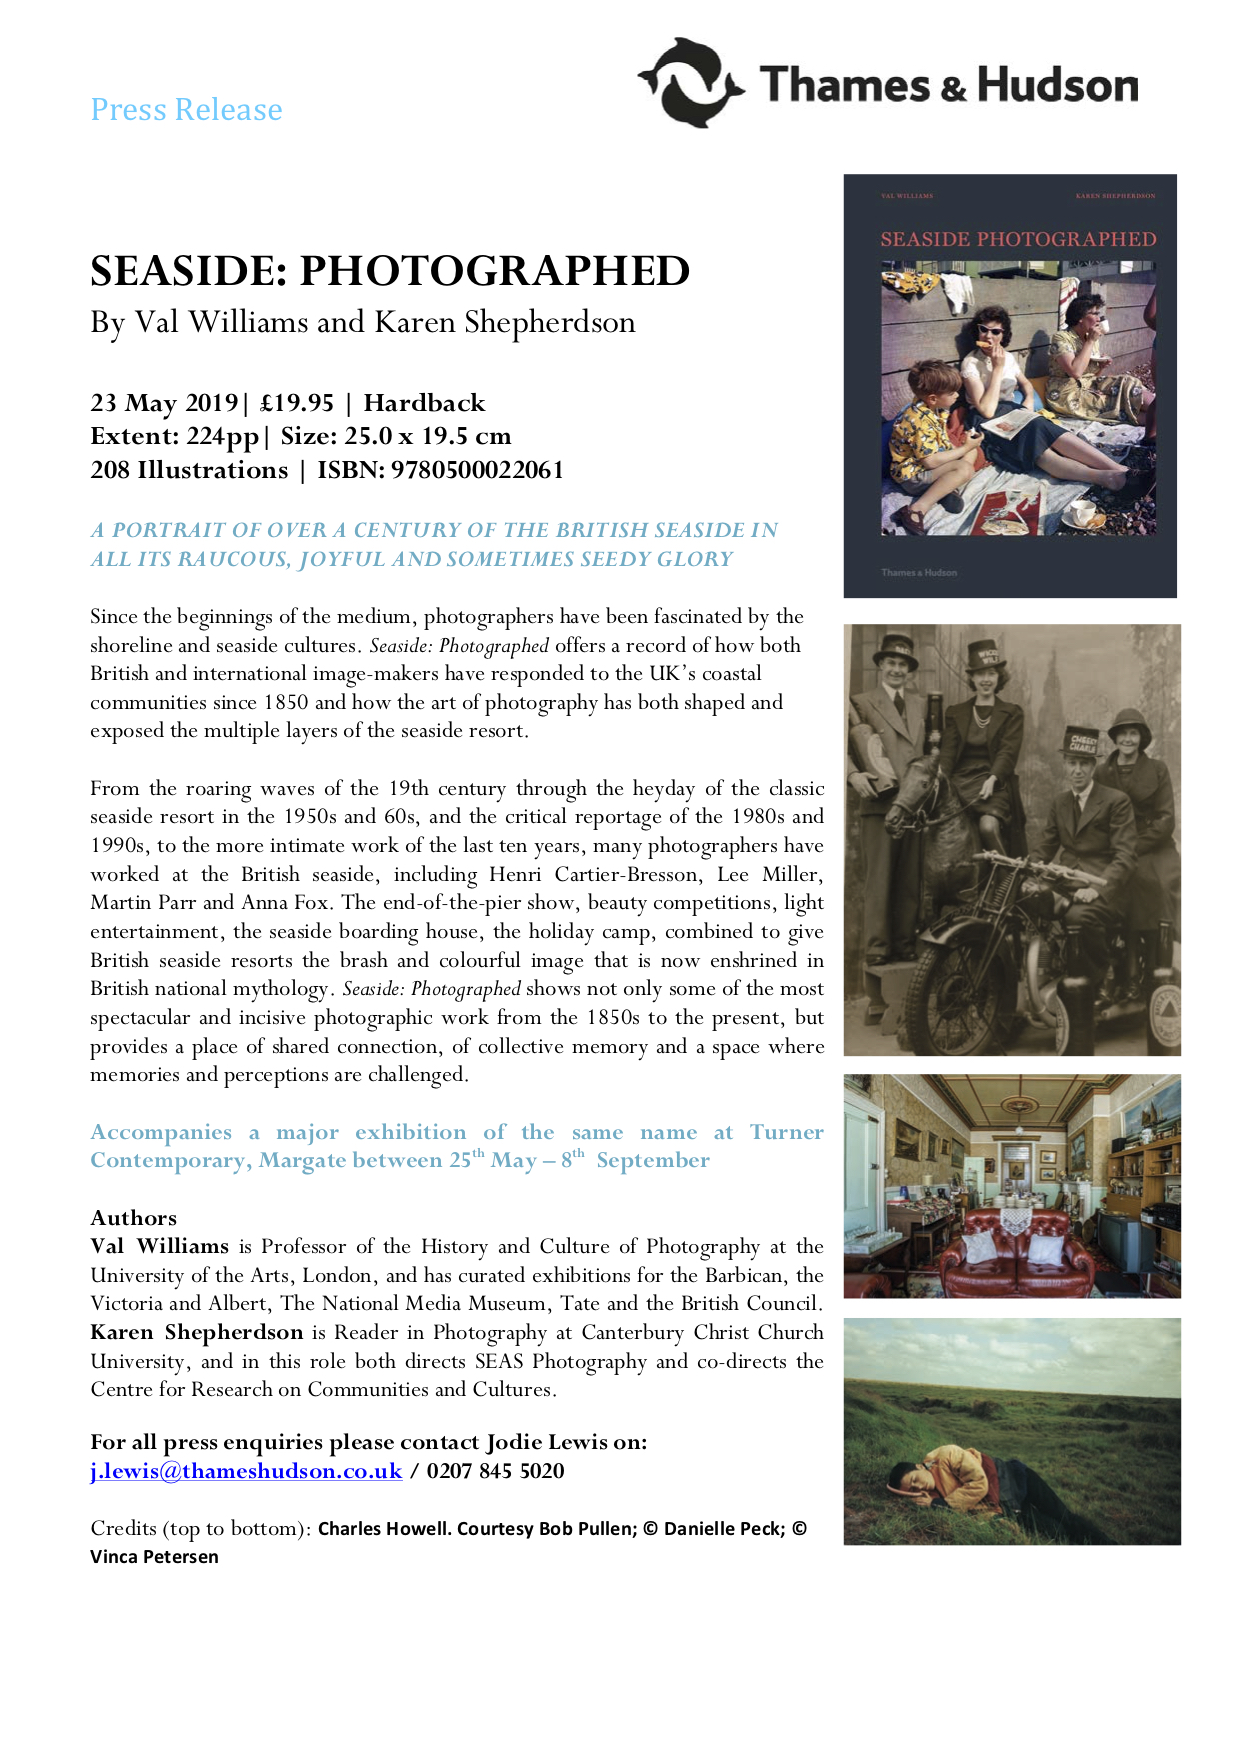 Press Release - Seaside Photographed copy.jpg